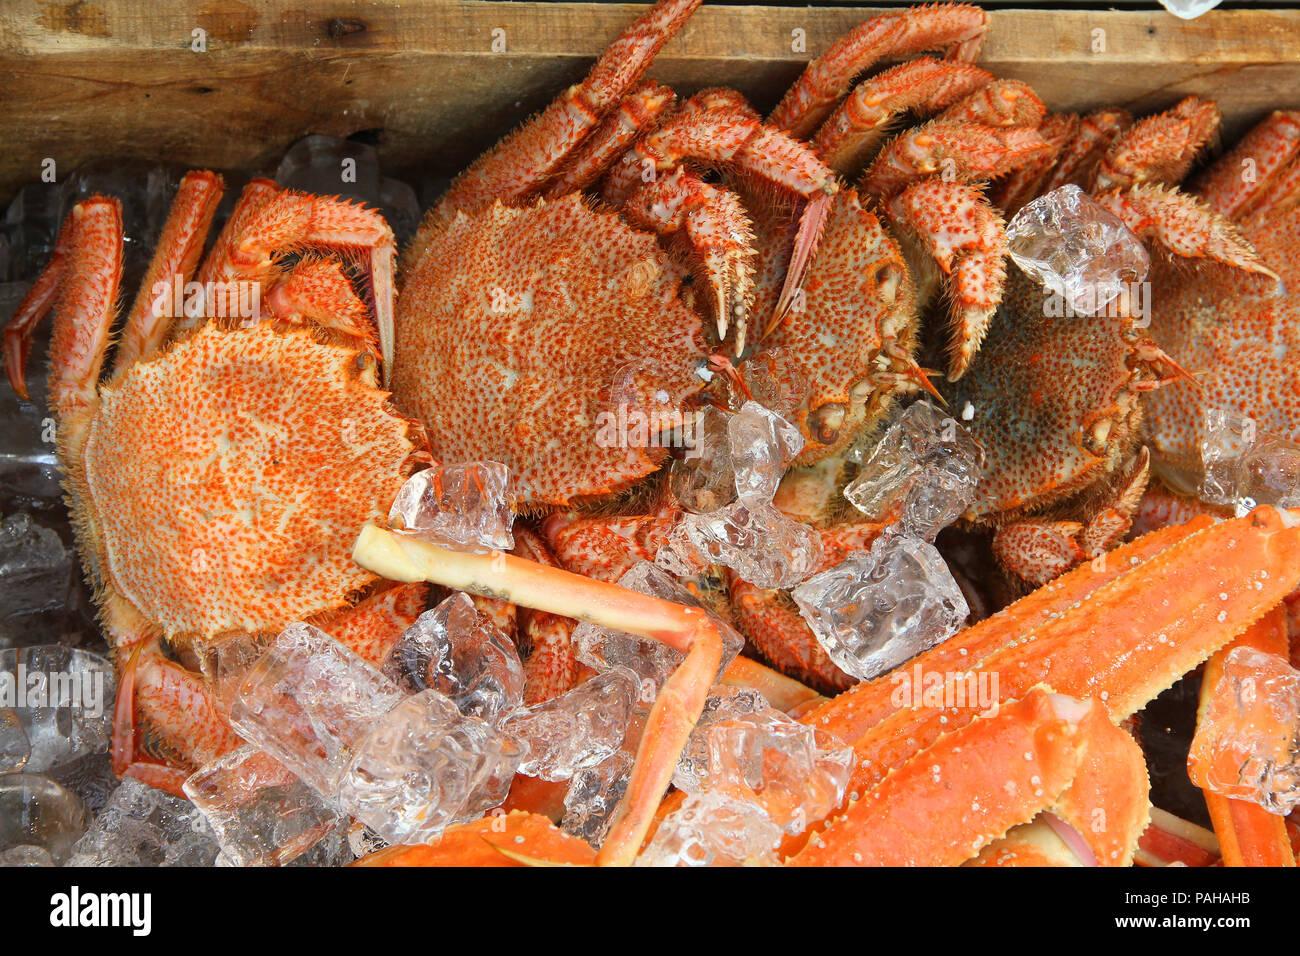 Kuromon Fish Market in Osaka, Japan. Fresh seafood - crabs in ice. - Stock Image